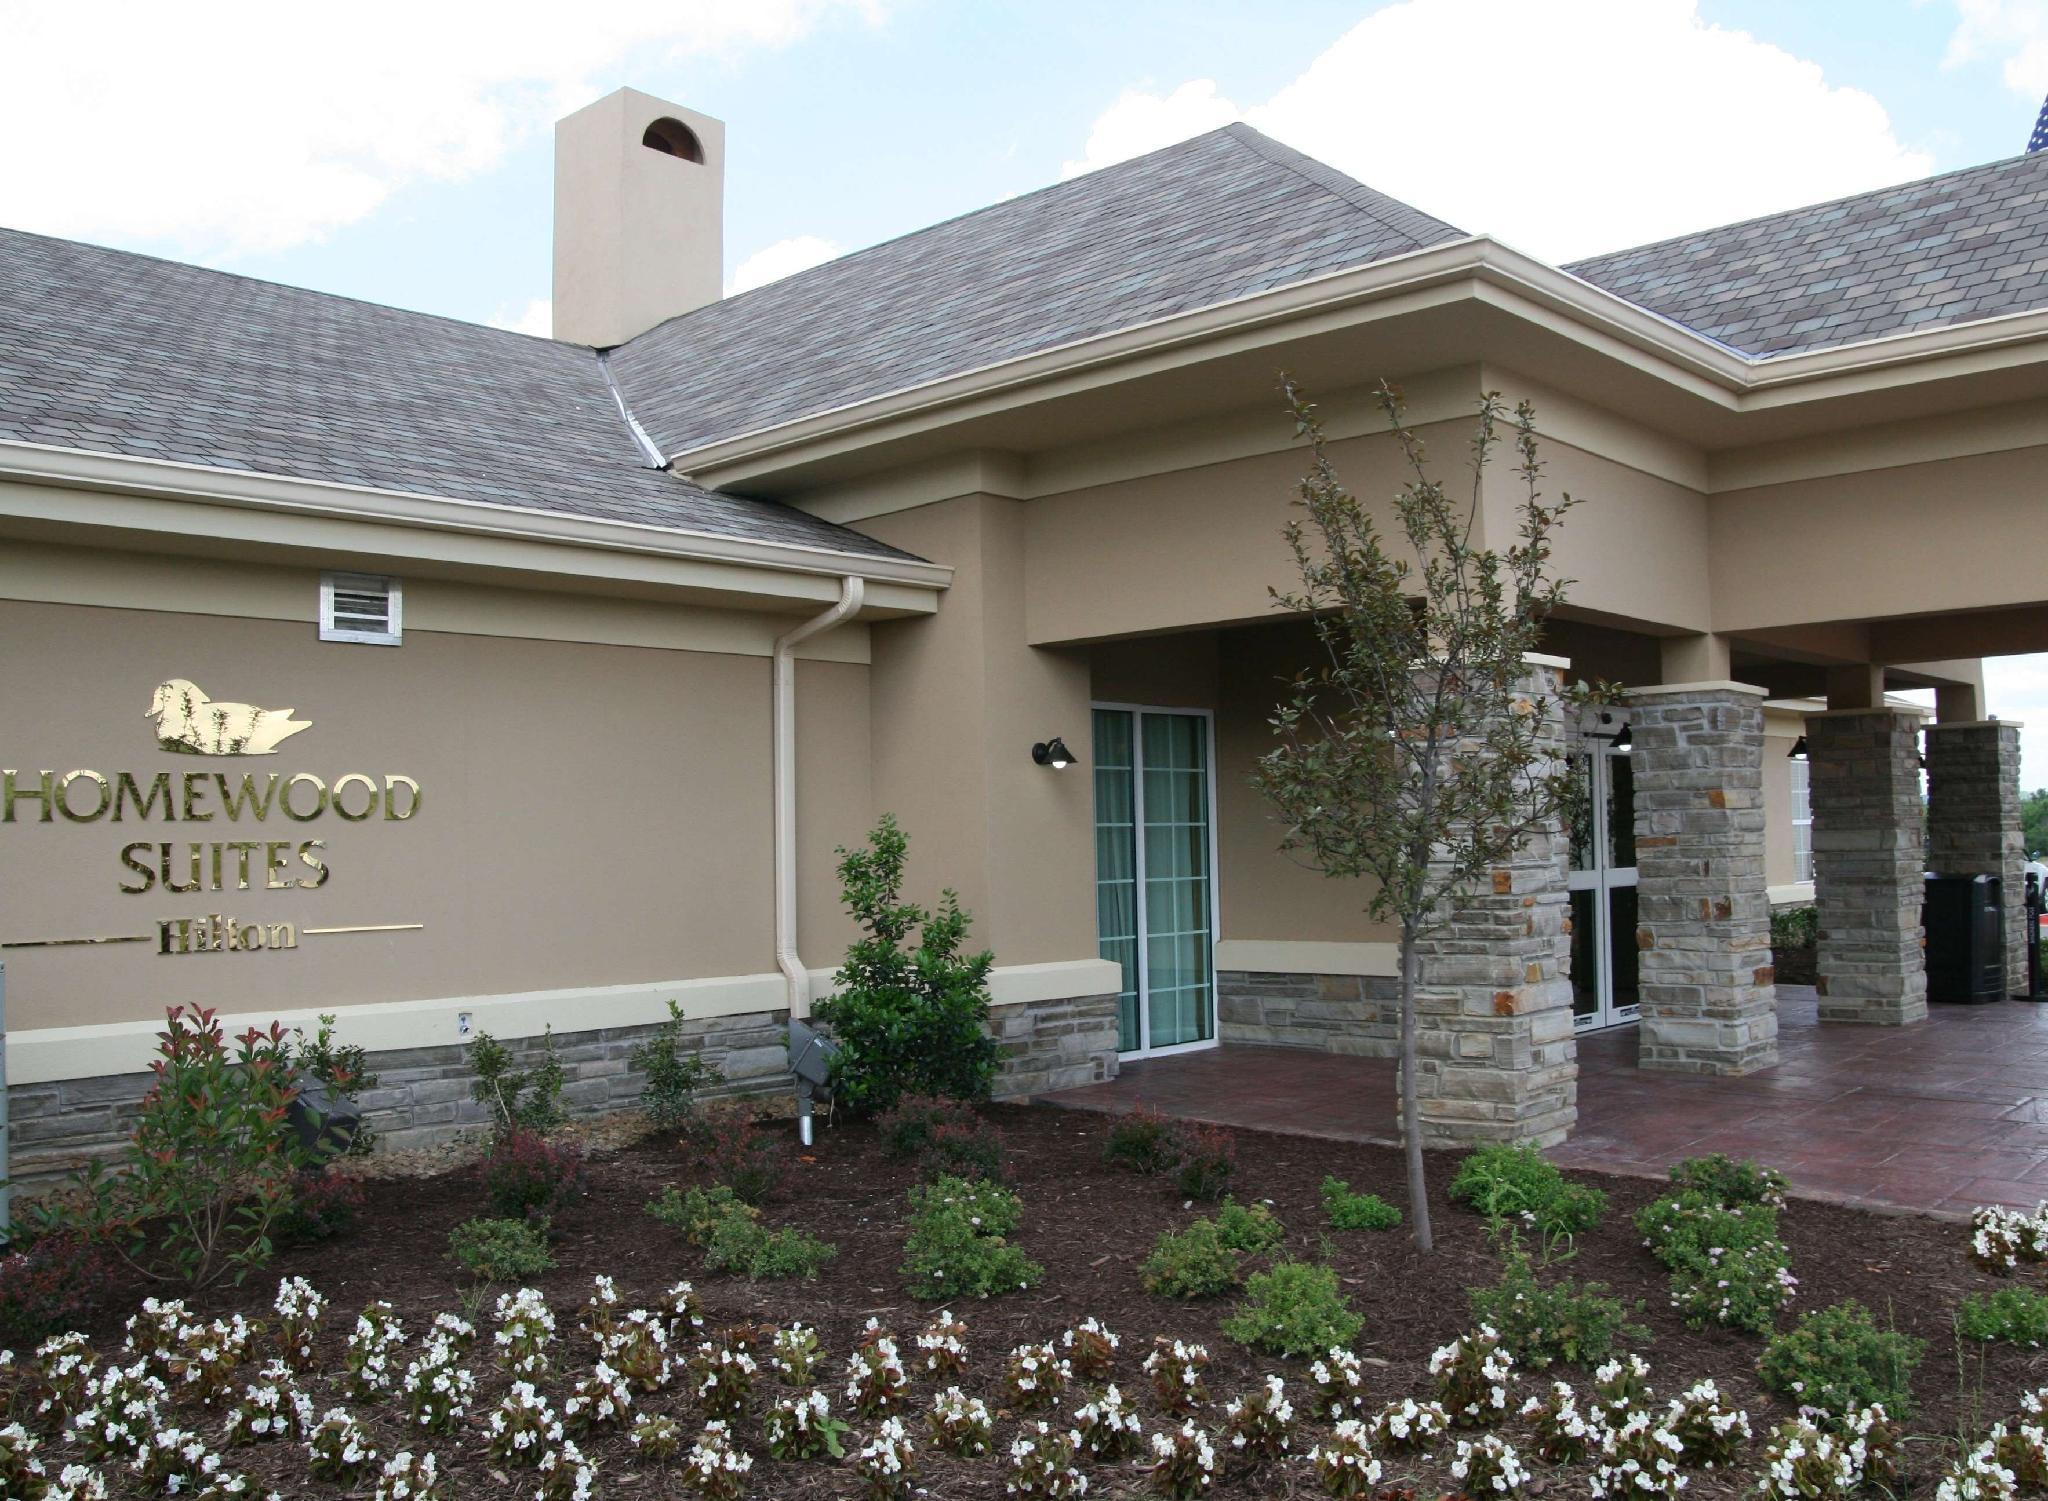 Homewood Suites By Hilton Fayetteville Arkansas